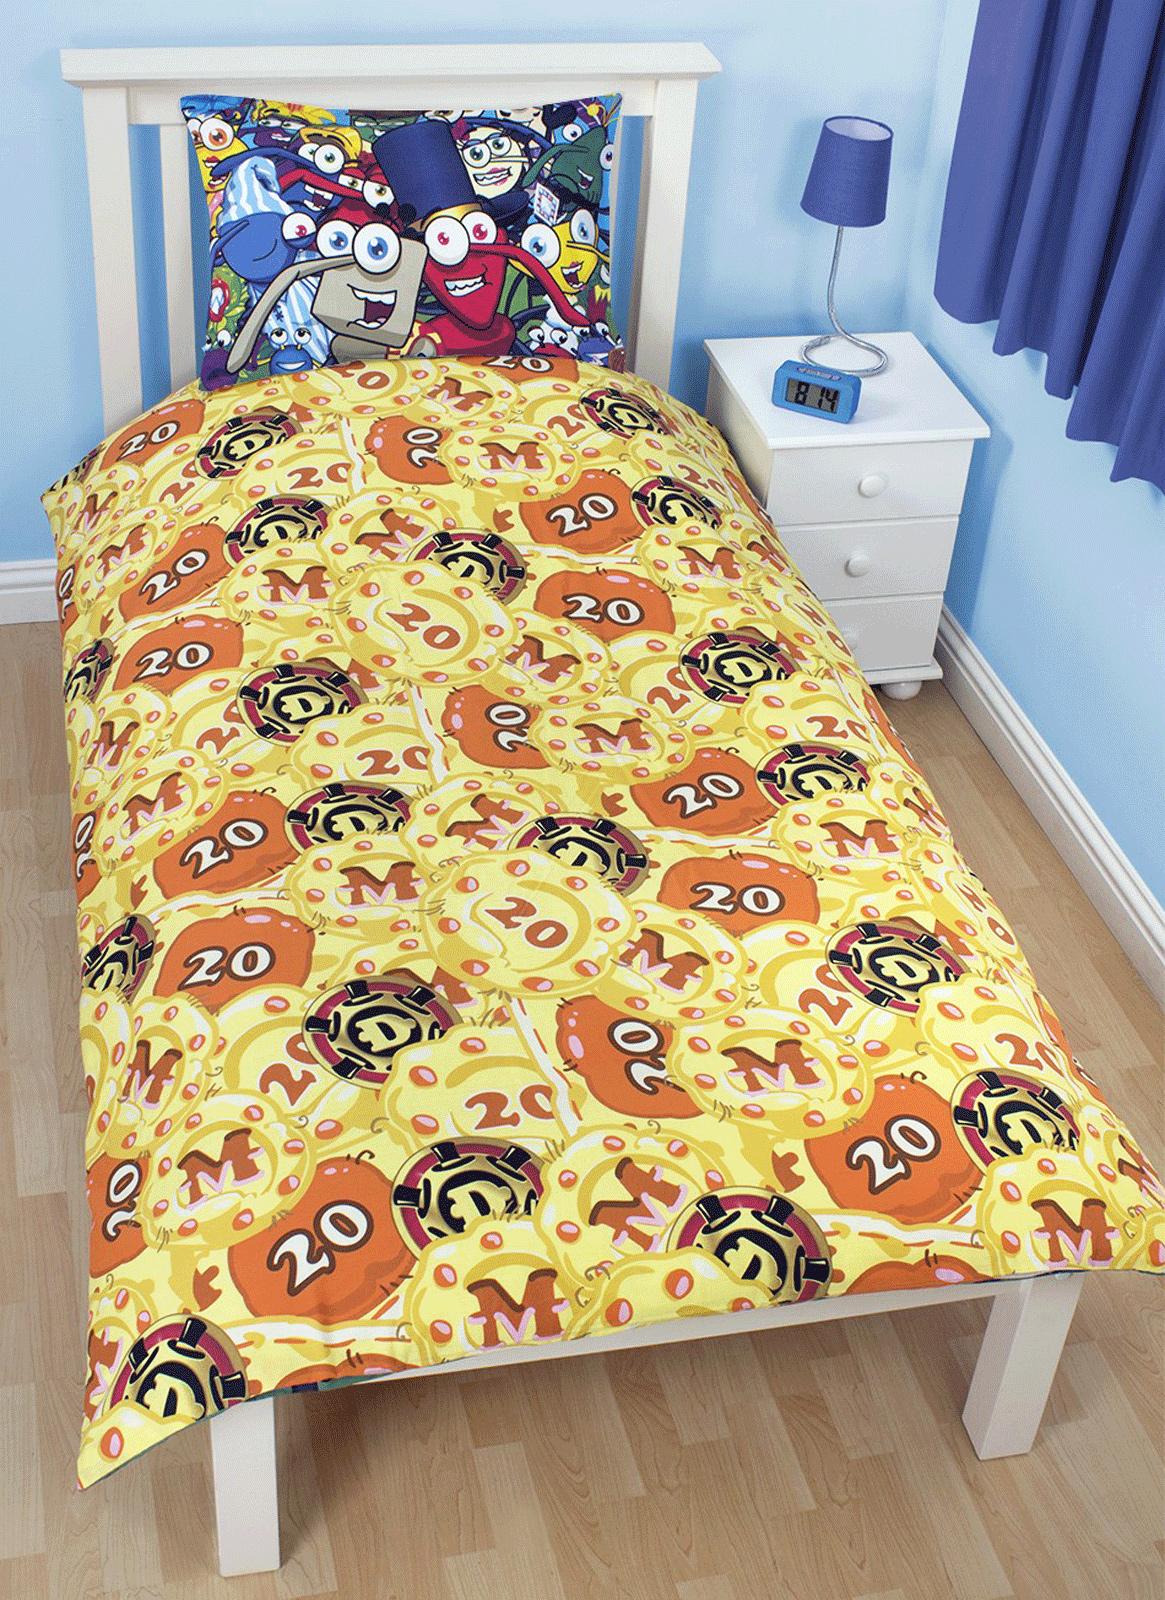 Childrens-Characters-Single-Bed-Quilt-Duvet-Cover-amp-Pillowcase-Kids-Bedding-Set thumbnail 164